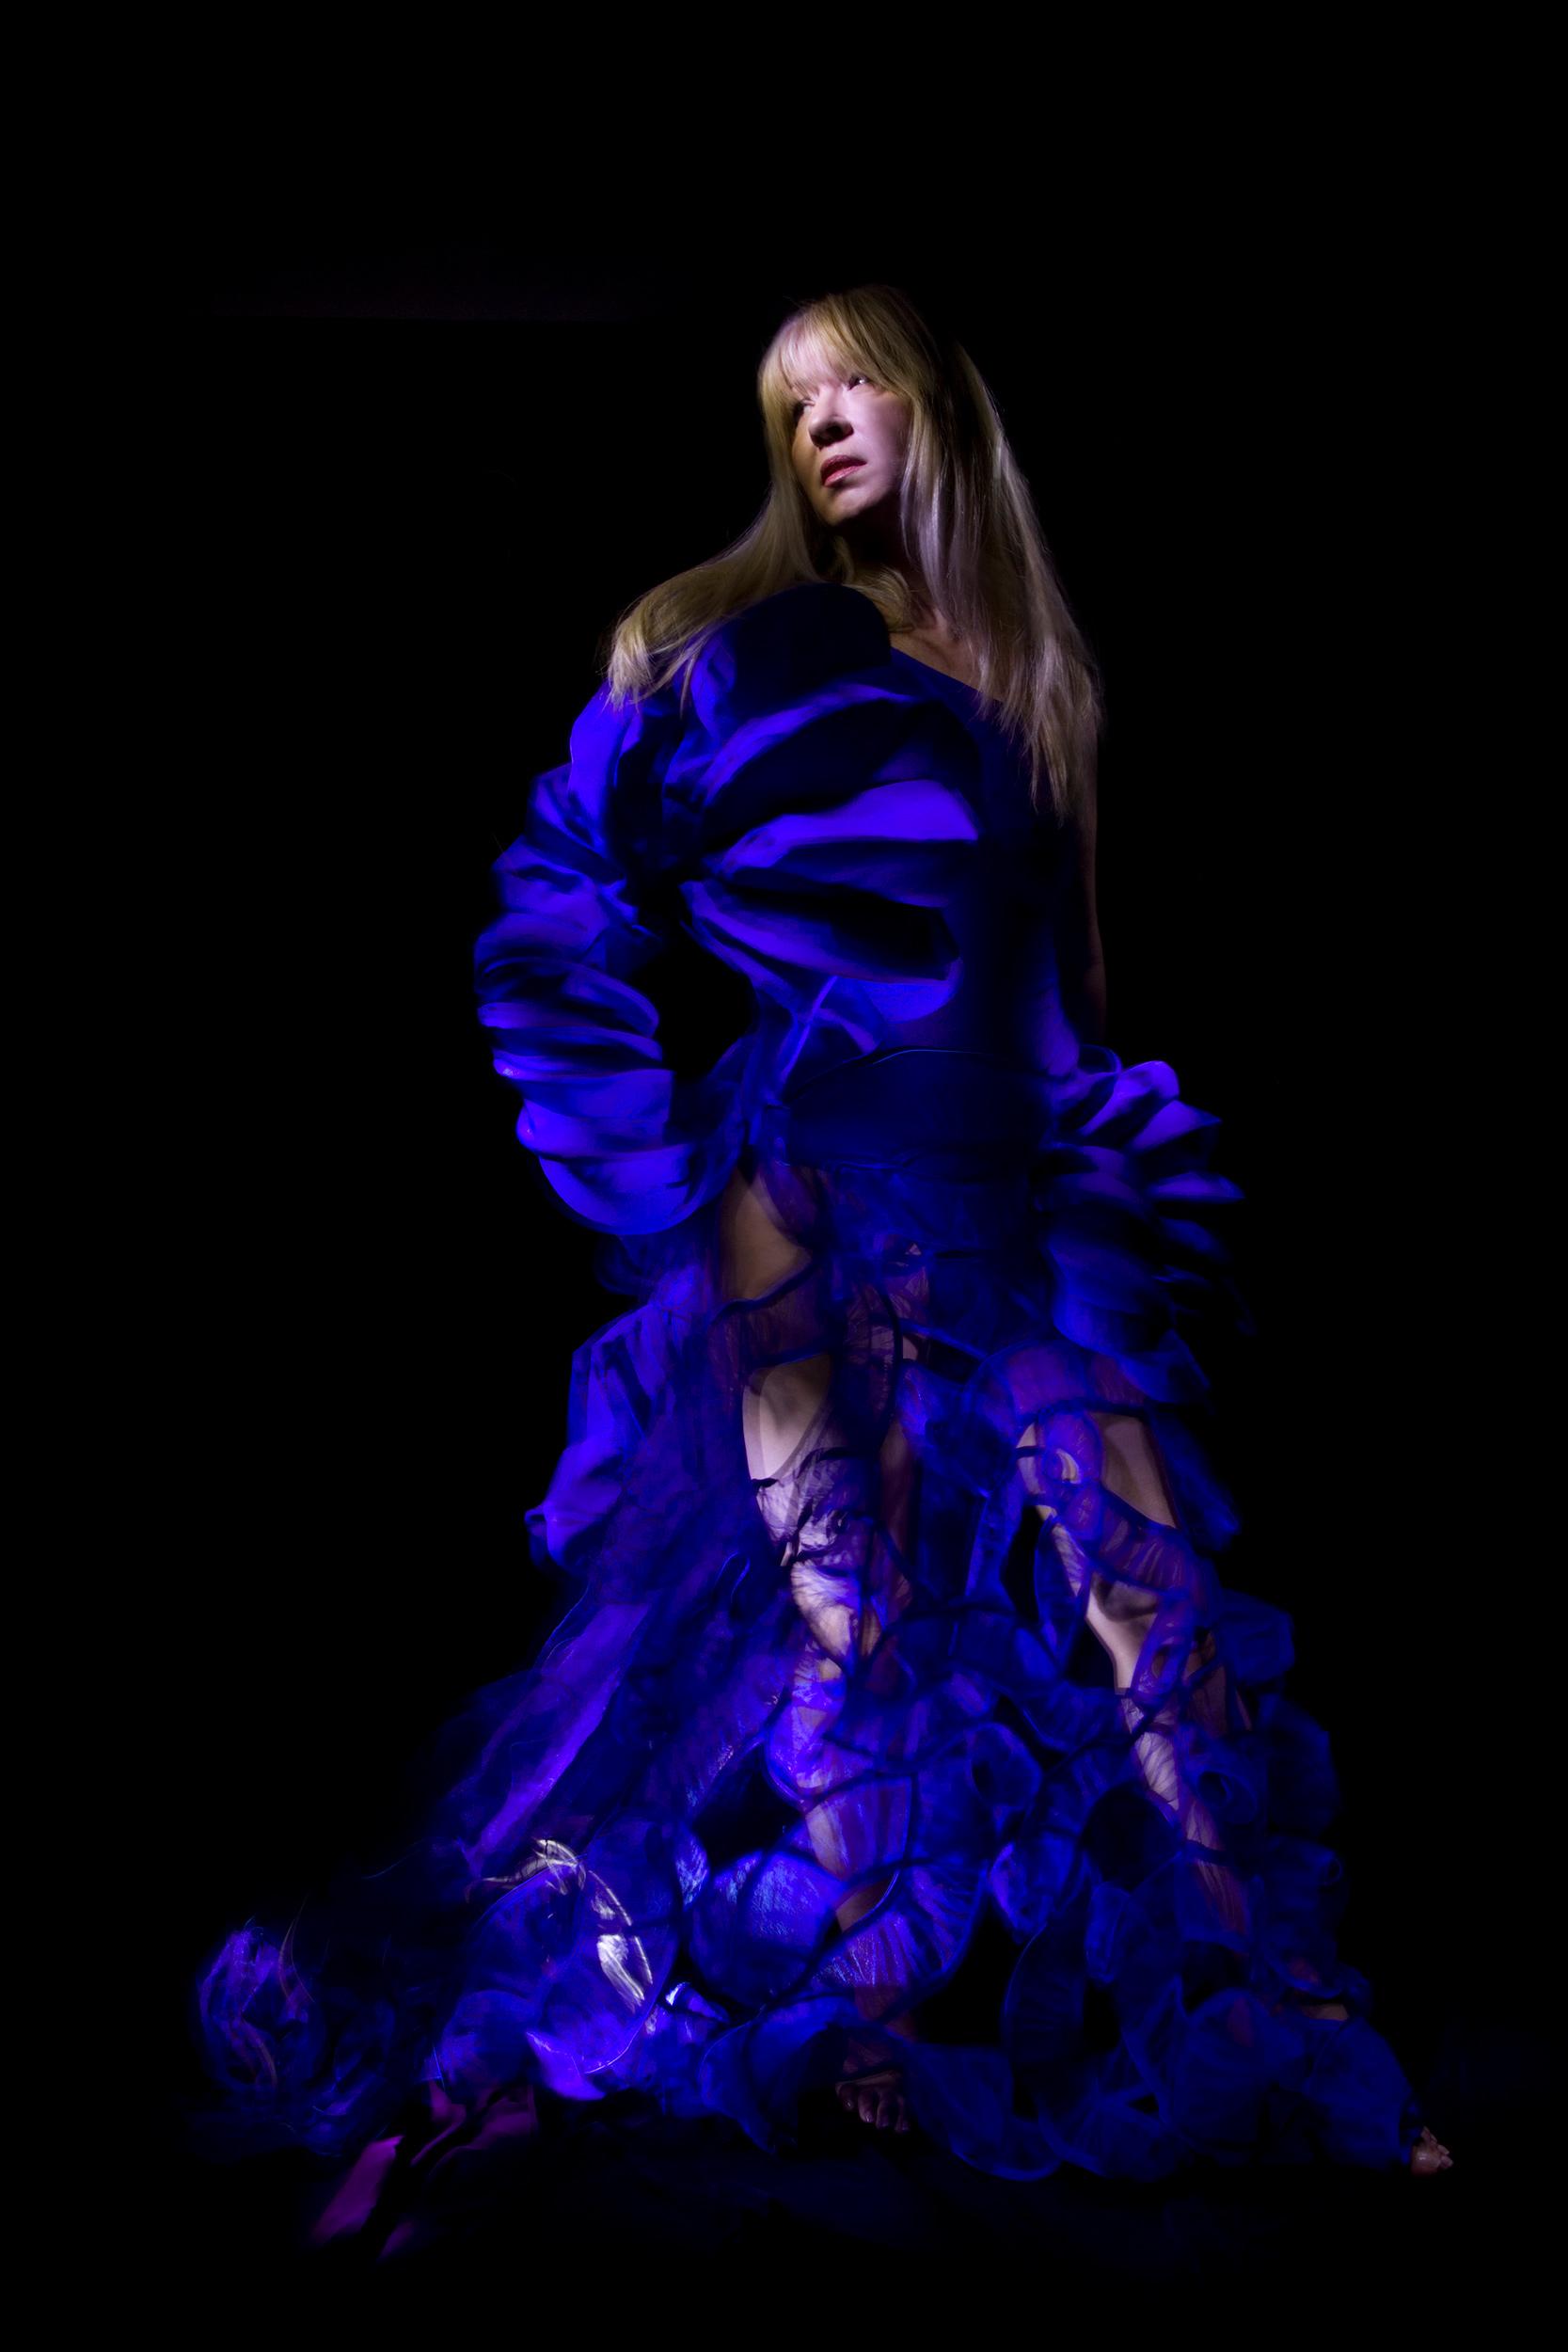 fashion_lightpainting_photography_by_Catalin_Anastase_MG_9870.jpg